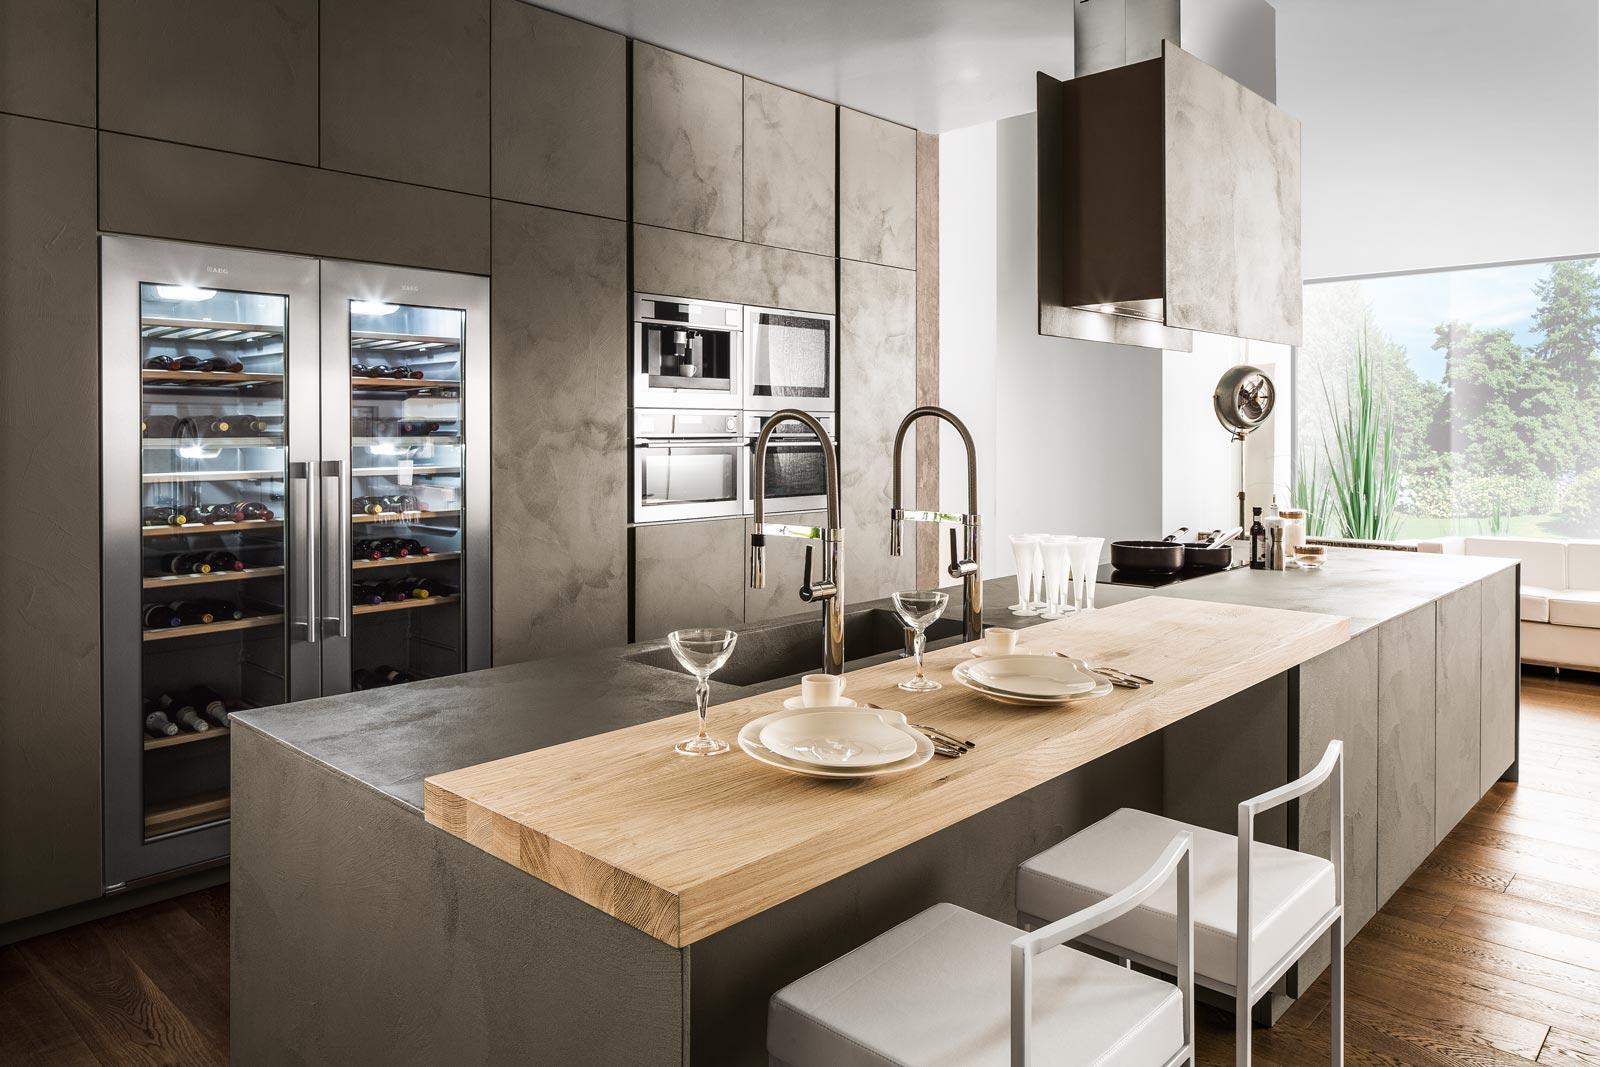 Home arredamenti cucine siciliane for Cucine pinterest